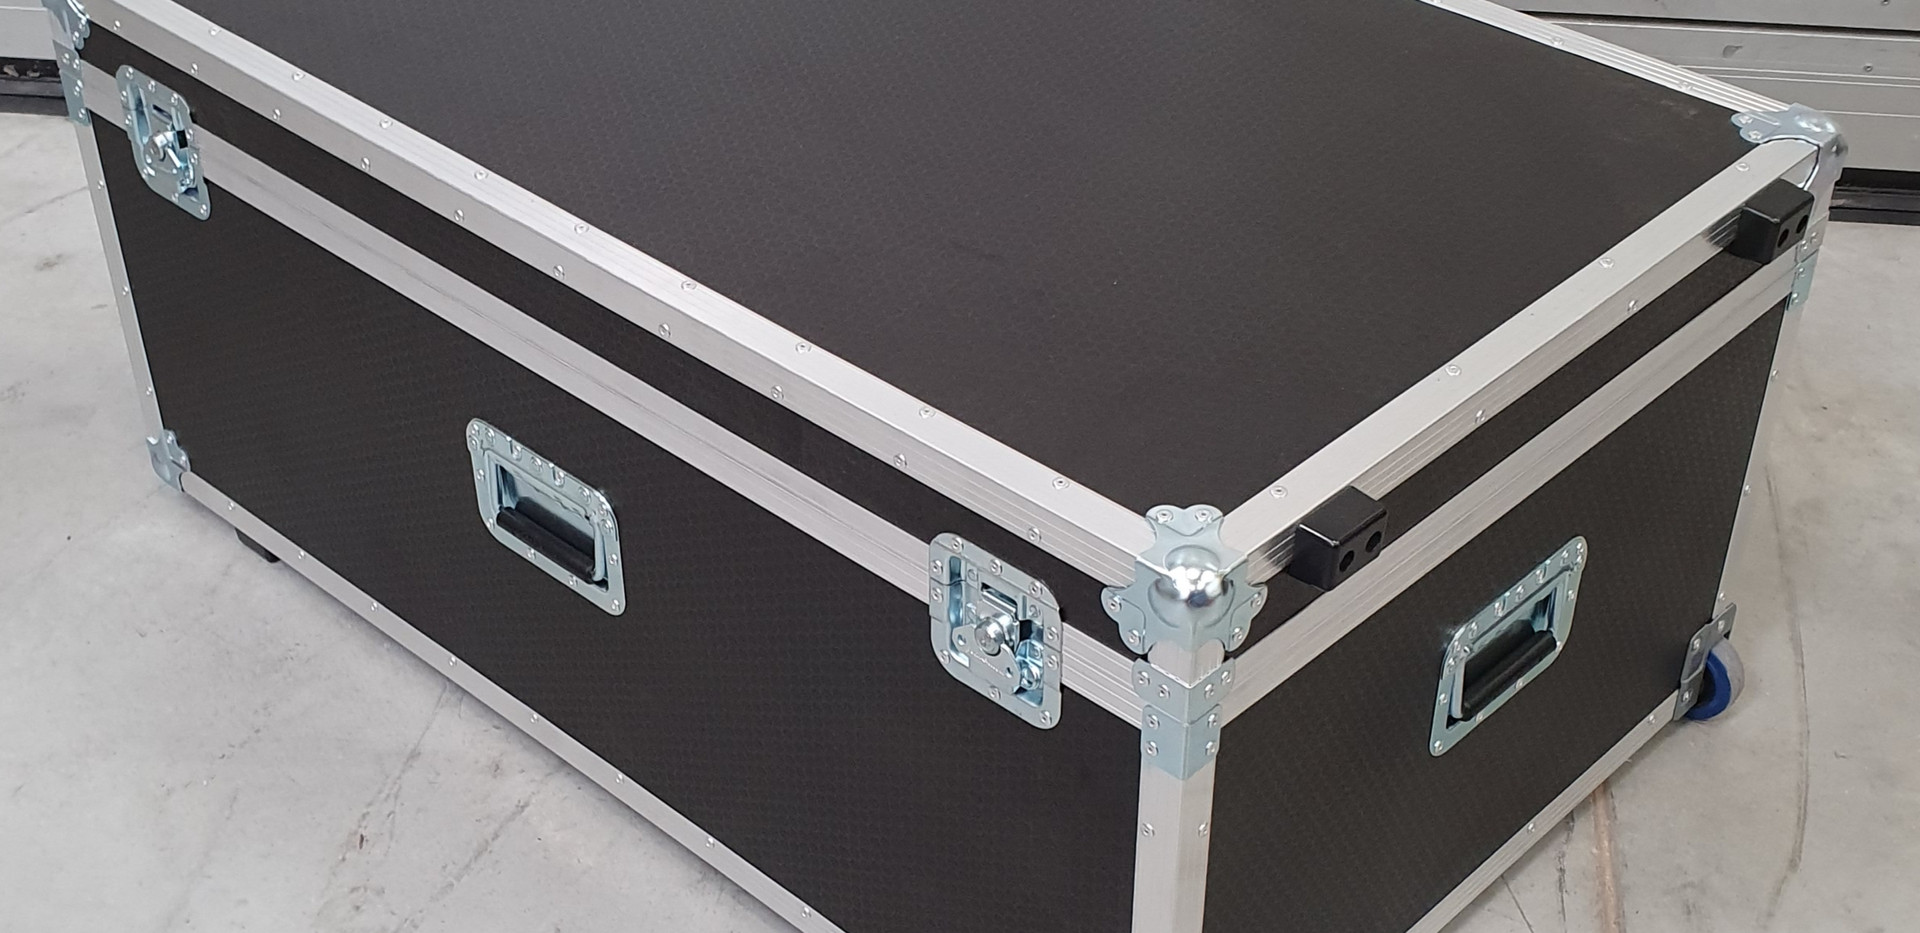 DJ booth transport case